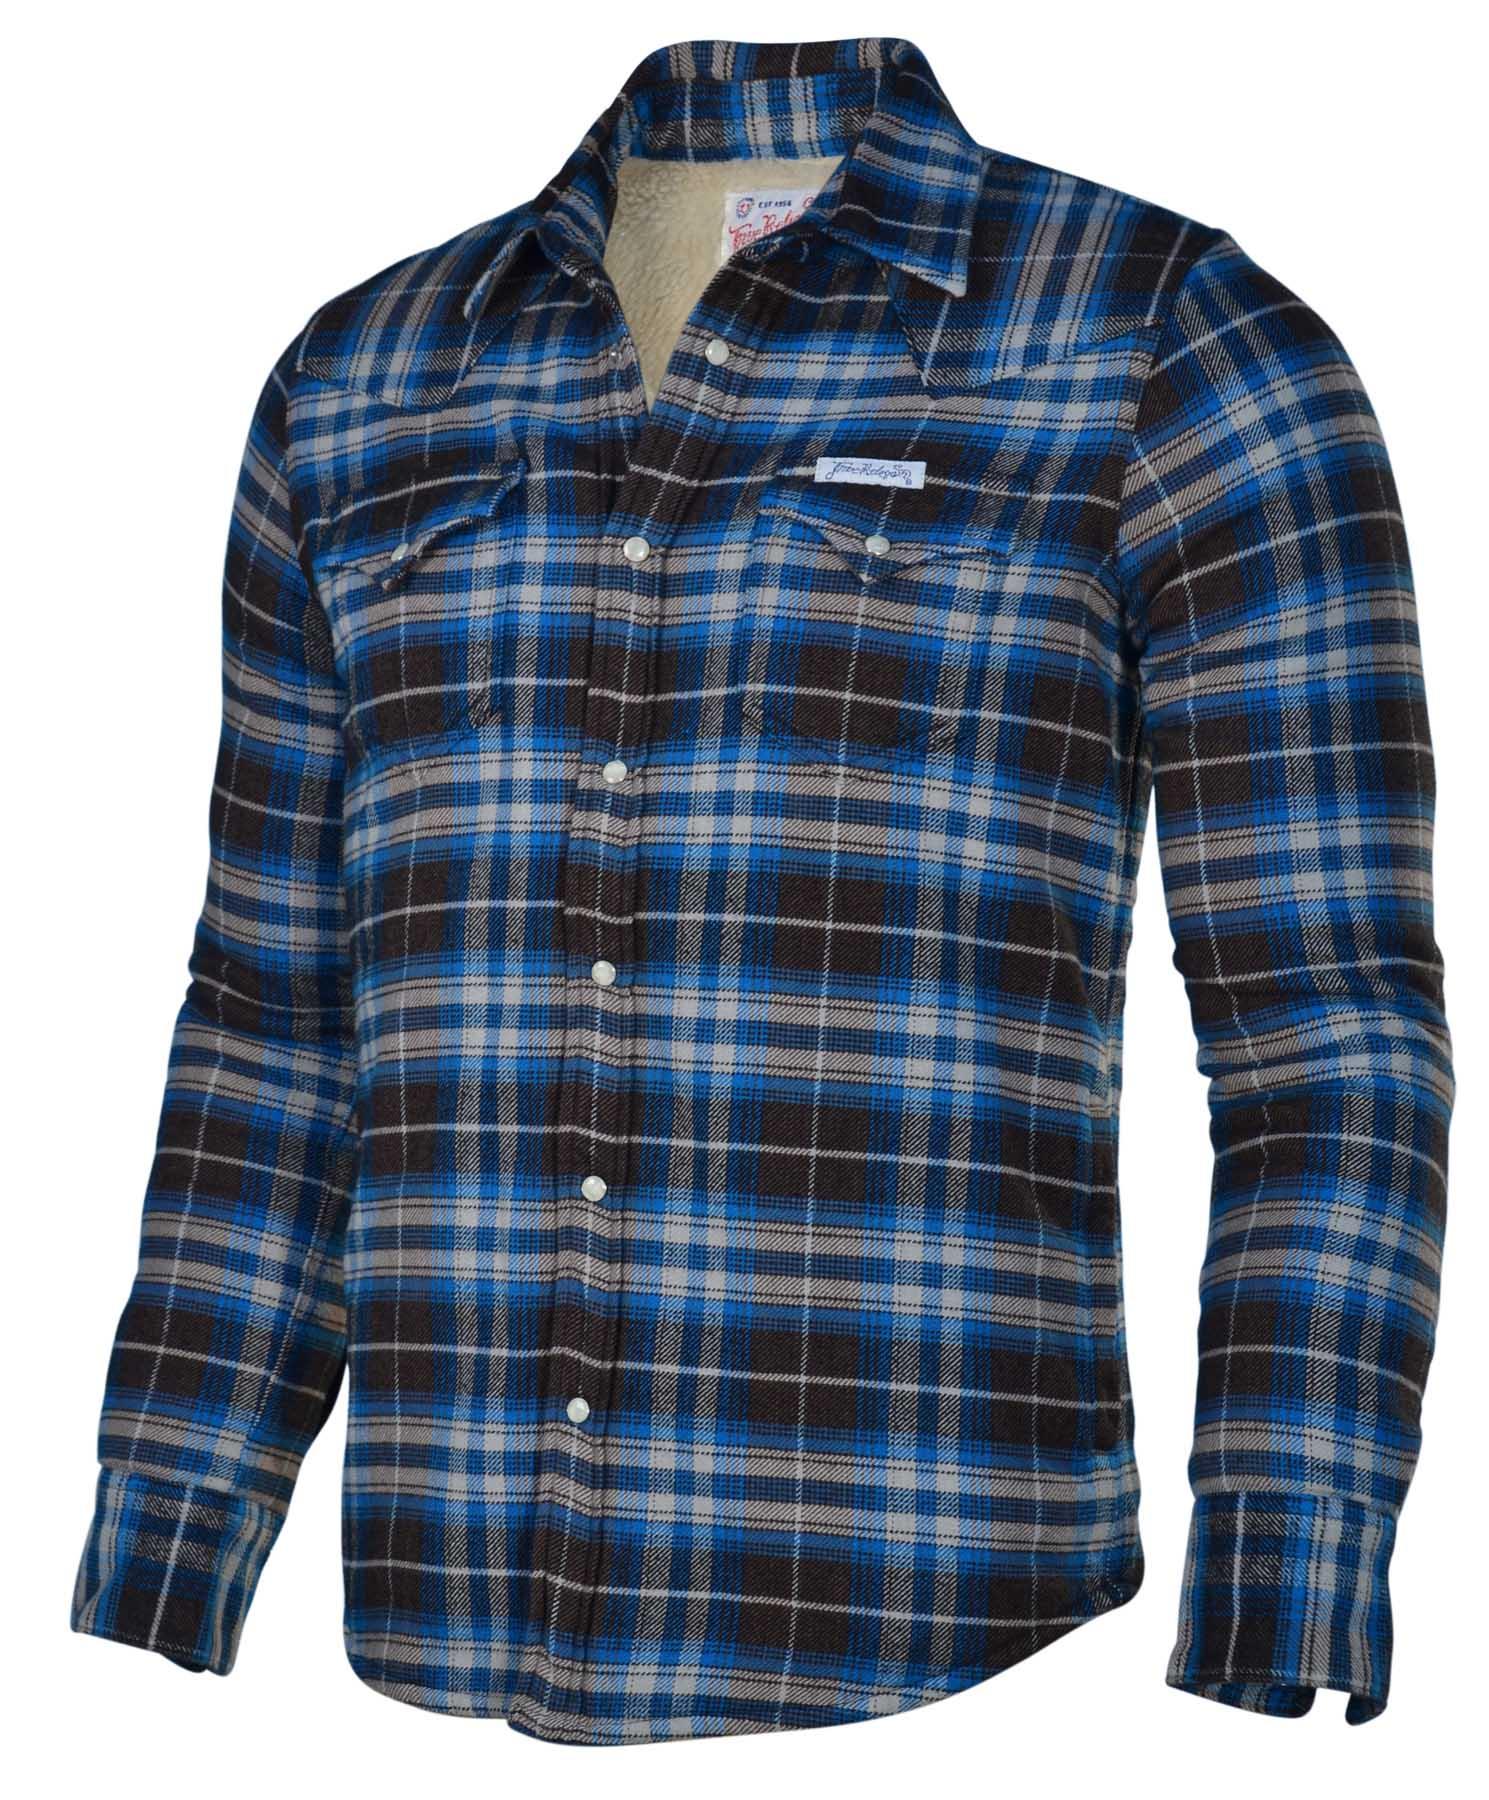 True religion brand jeans men 39 s flannel plaid sherpa shirt for Best flannel shirt brands